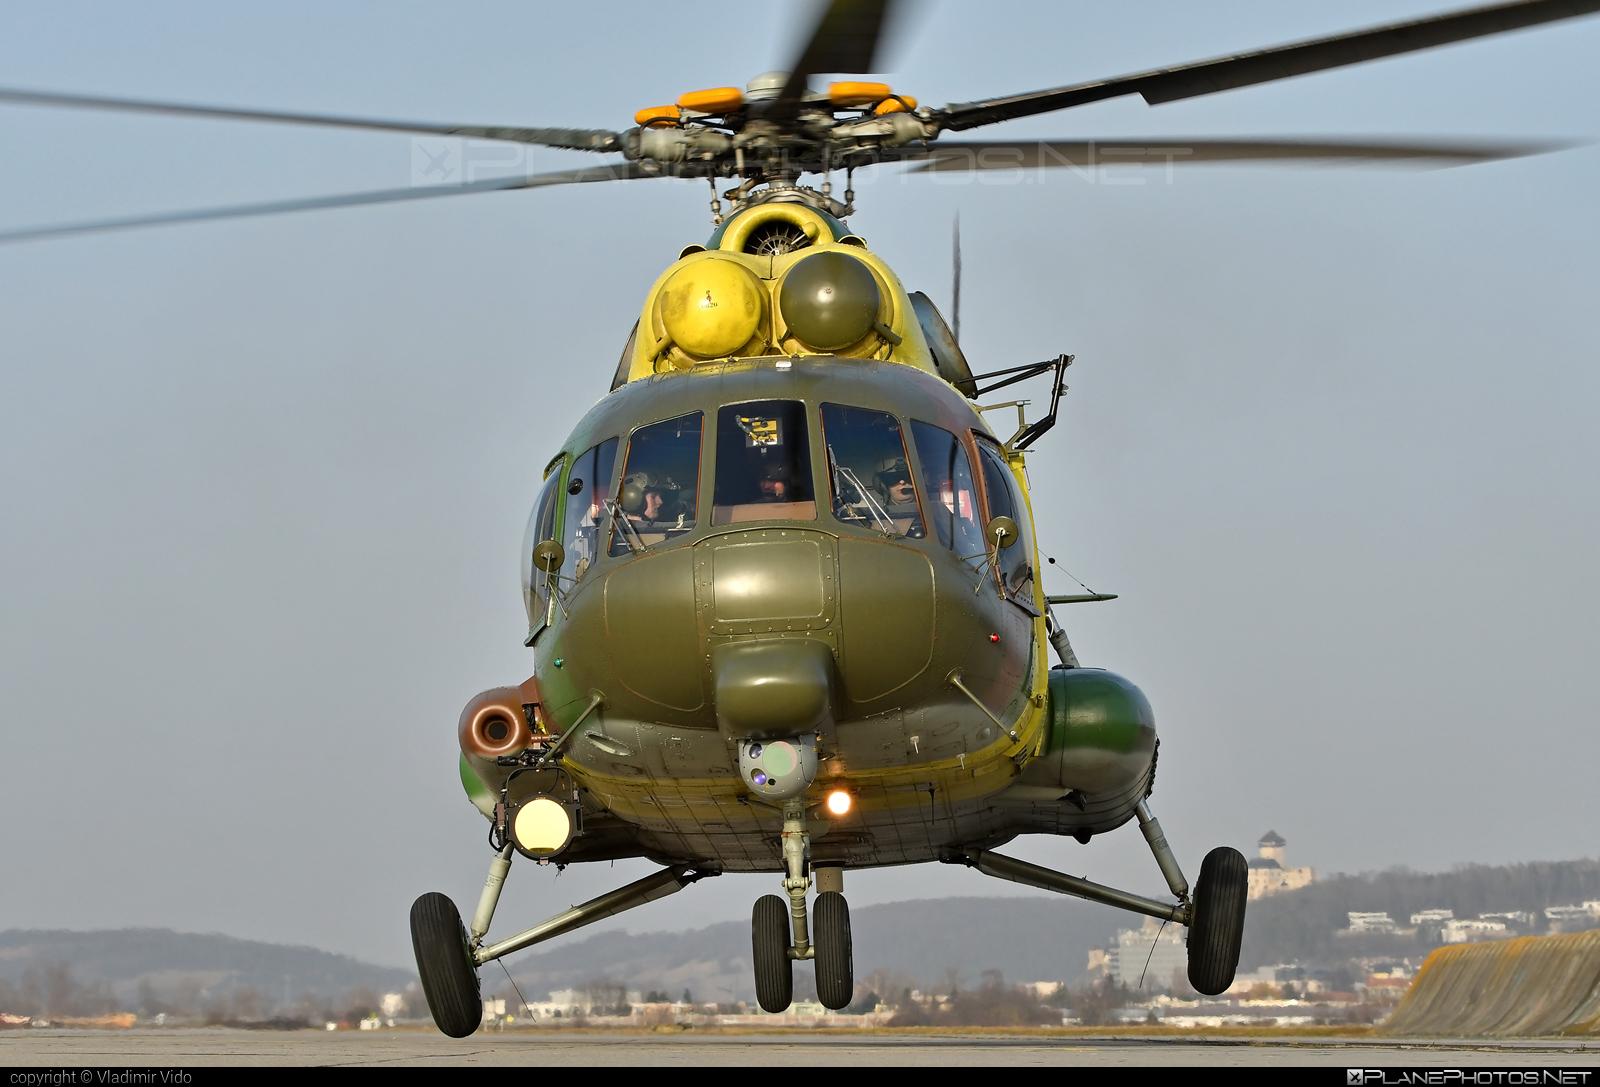 Mil Mi-17LPZS - 0820 operated by Vzdušné sily OS SR (Slovak Air Force) #mi17 #mi17lpzs #mil #milhelicopters #milmi17 #milmi17lpzs #slovakairforce #vzdusnesilyossr